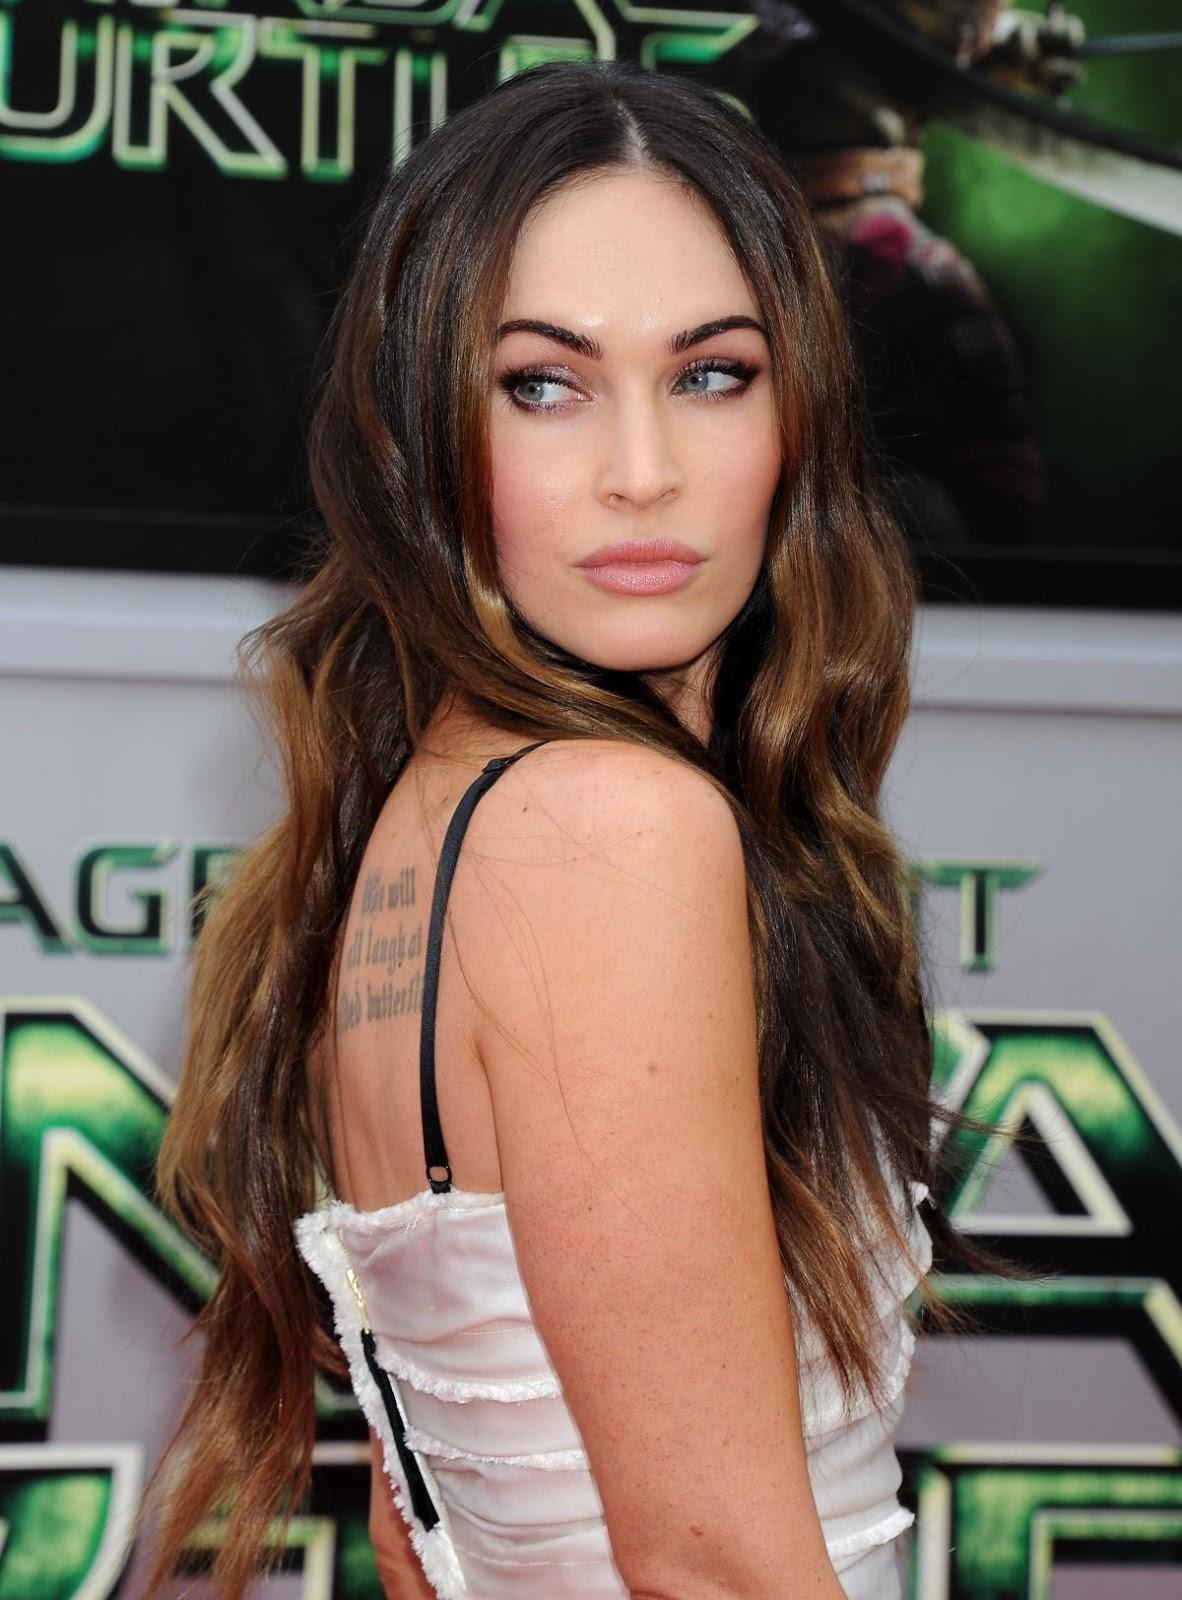 Full HQ Photos of Megan Fox with Back Tattoo At Teenage Mutant Ninja Turtles Premiere In Westwood